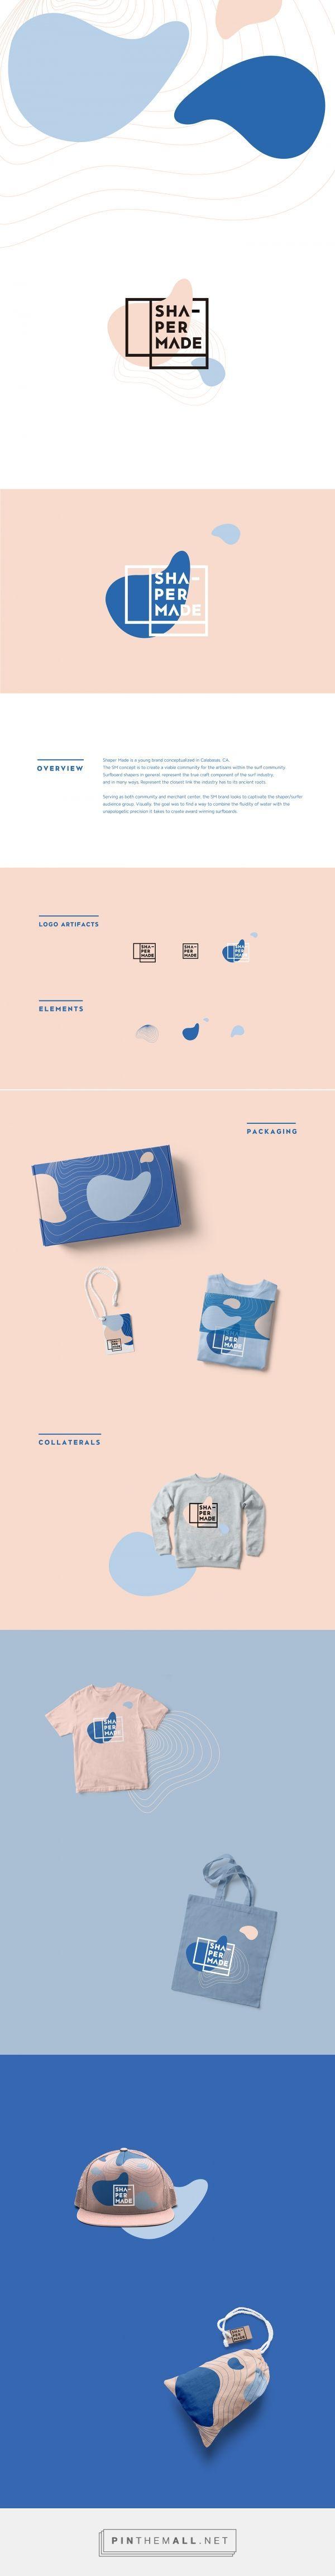 Shaper Made Branding by Mint Li on Behance | Fivestar Branding – Design and…